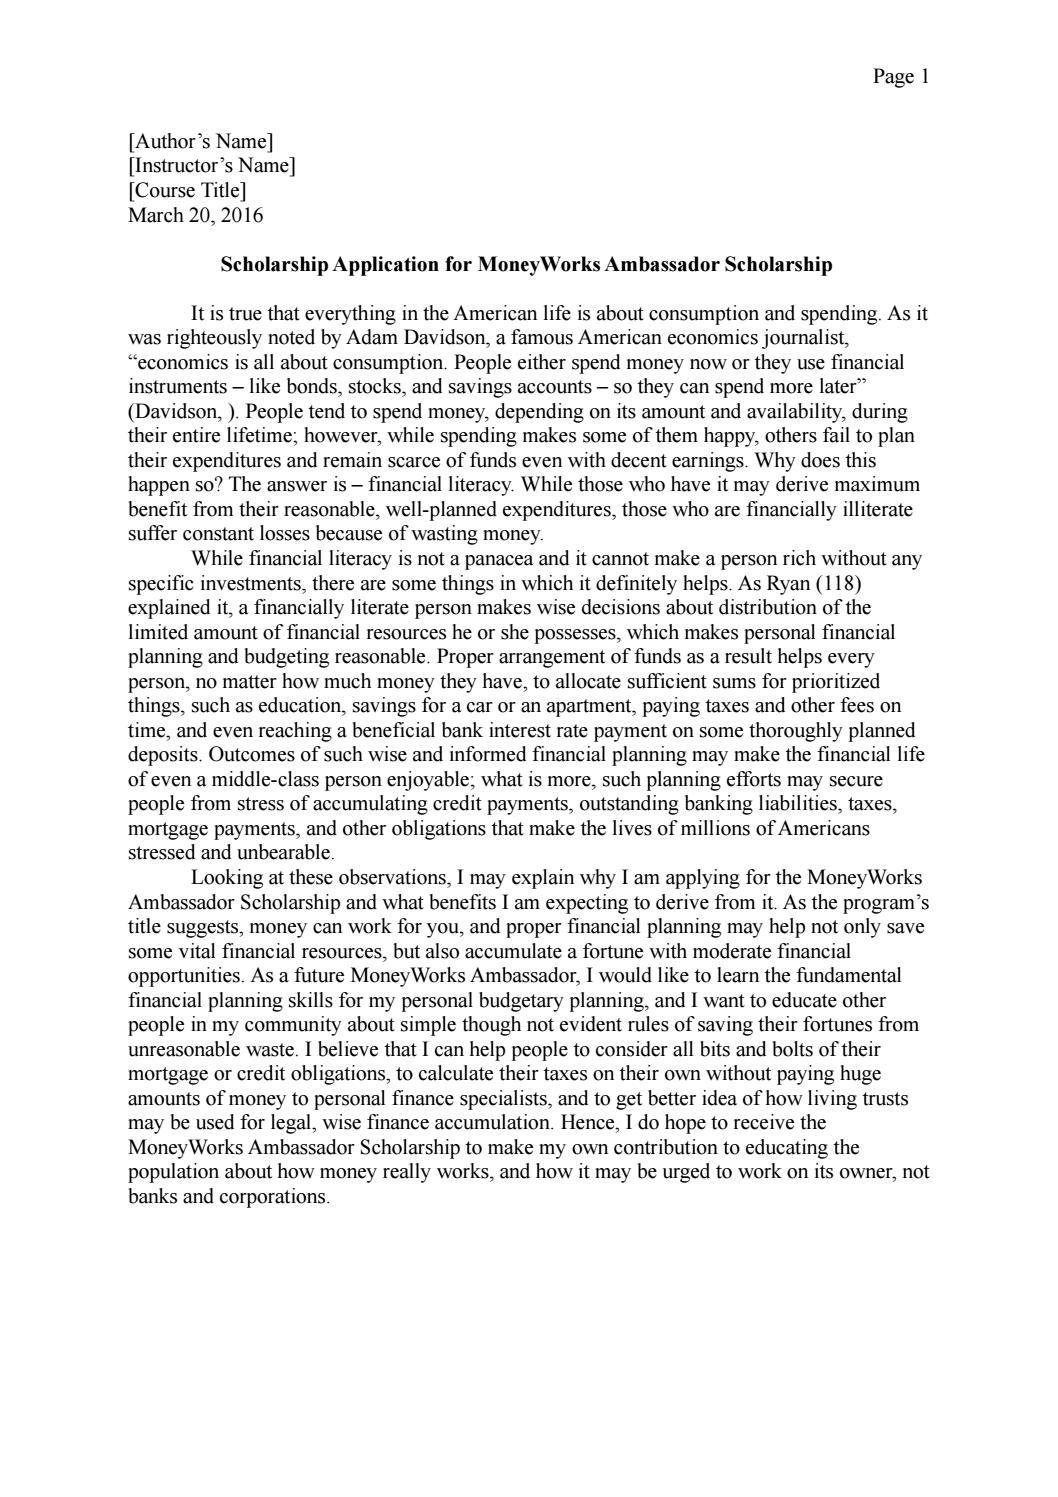 Ambassador scholarship essay